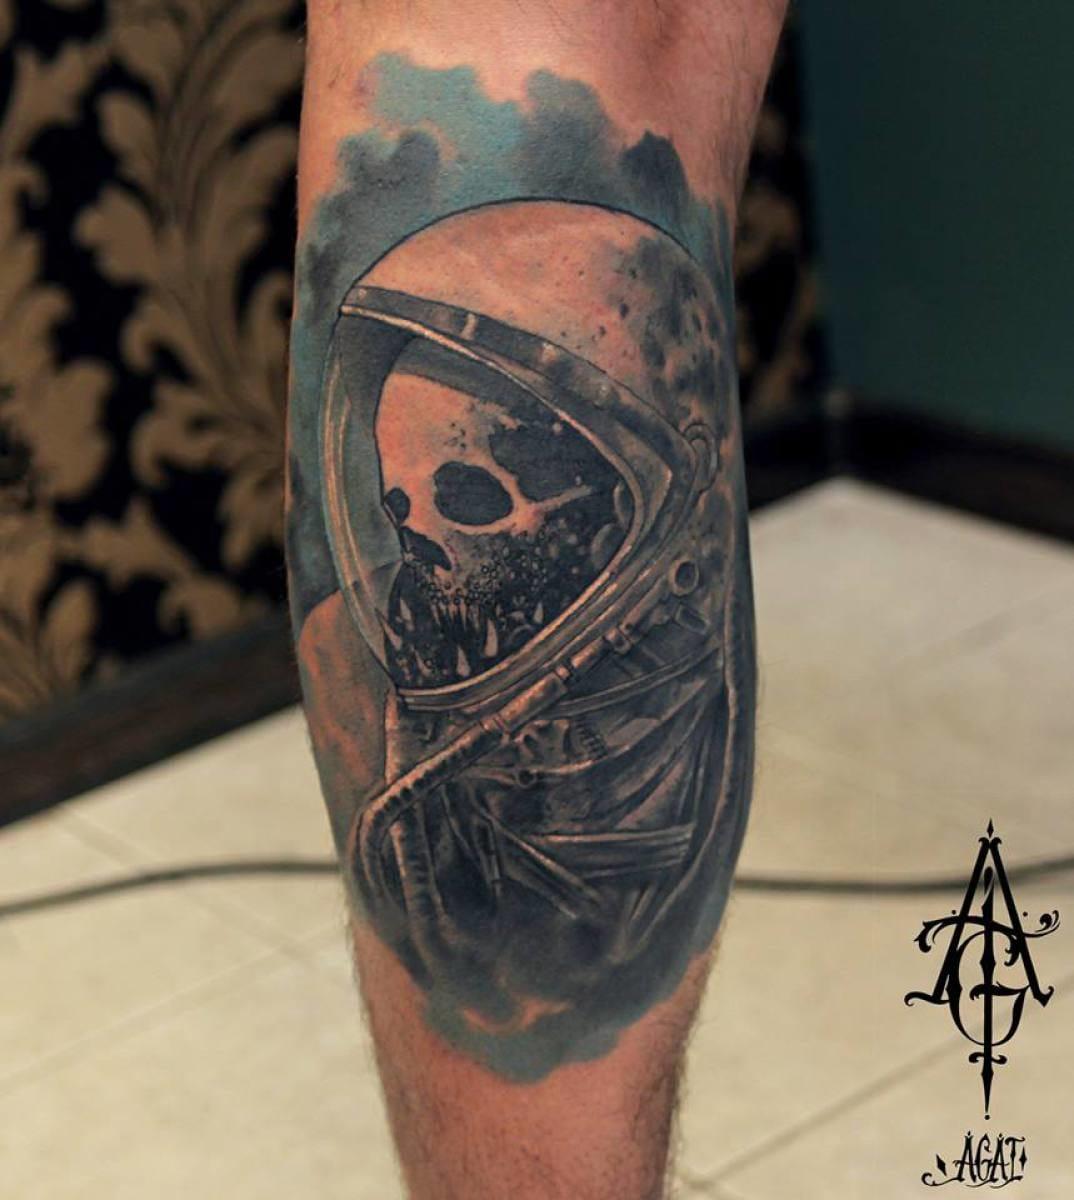 Amazing Tattoo by Agat Artemji